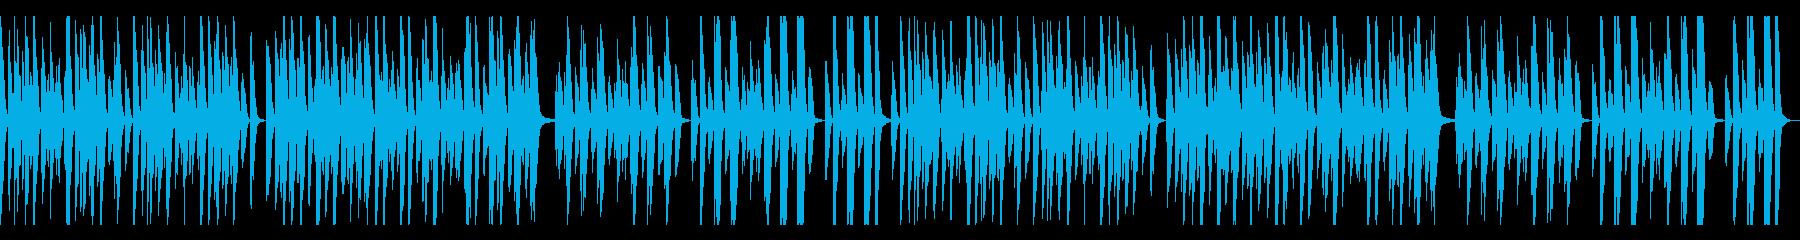 YouTube、トーク、ピアノ、木琴の再生済みの波形